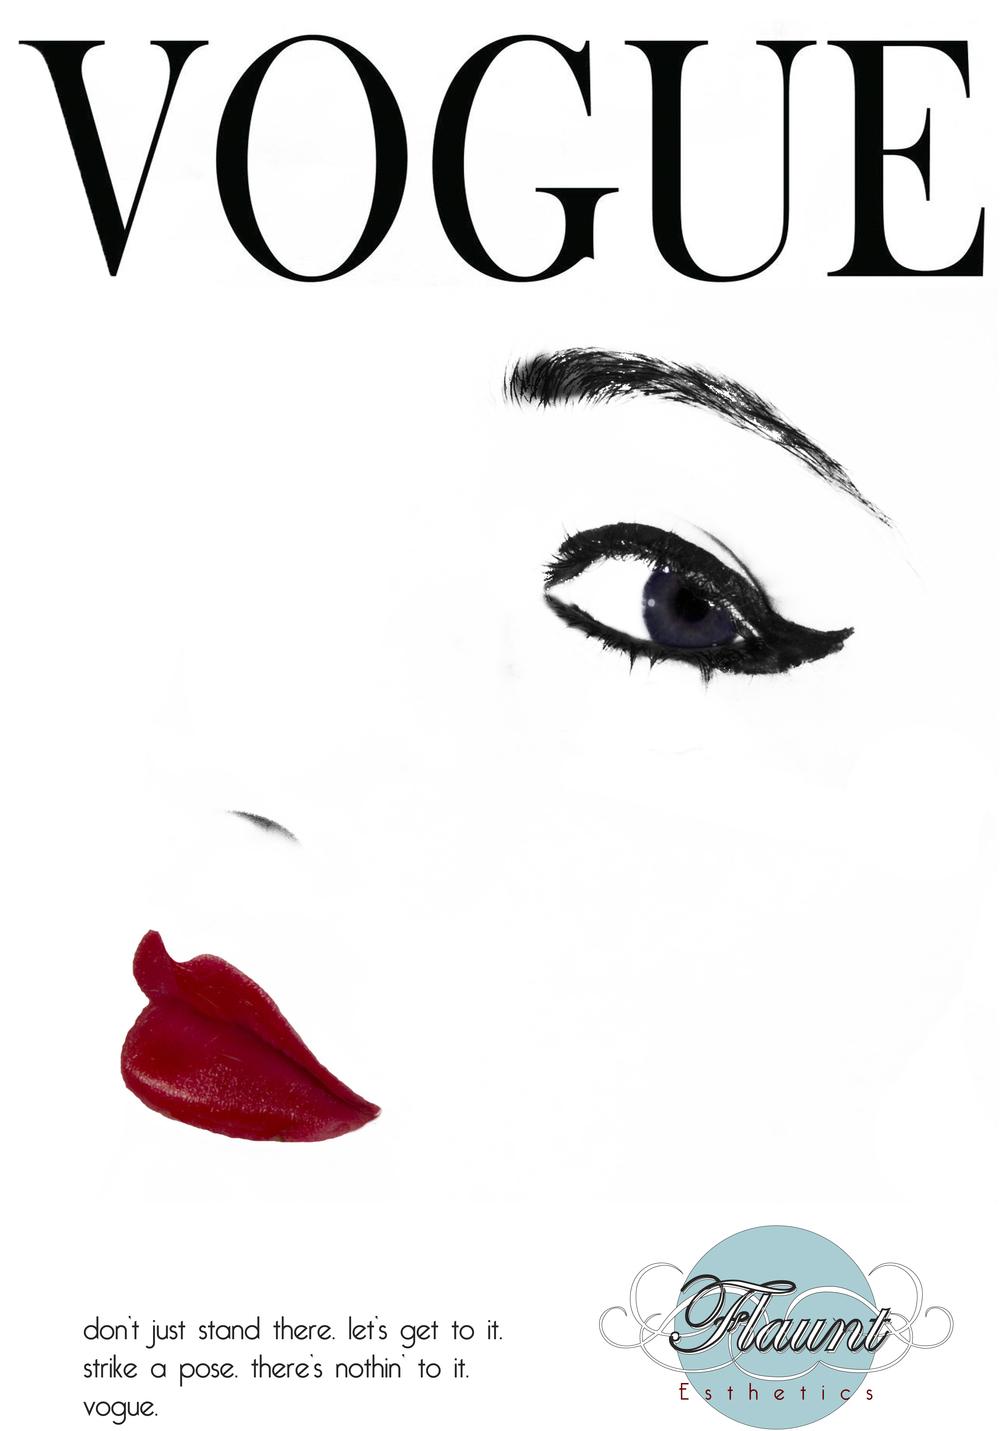 Vogue Poster.jpg